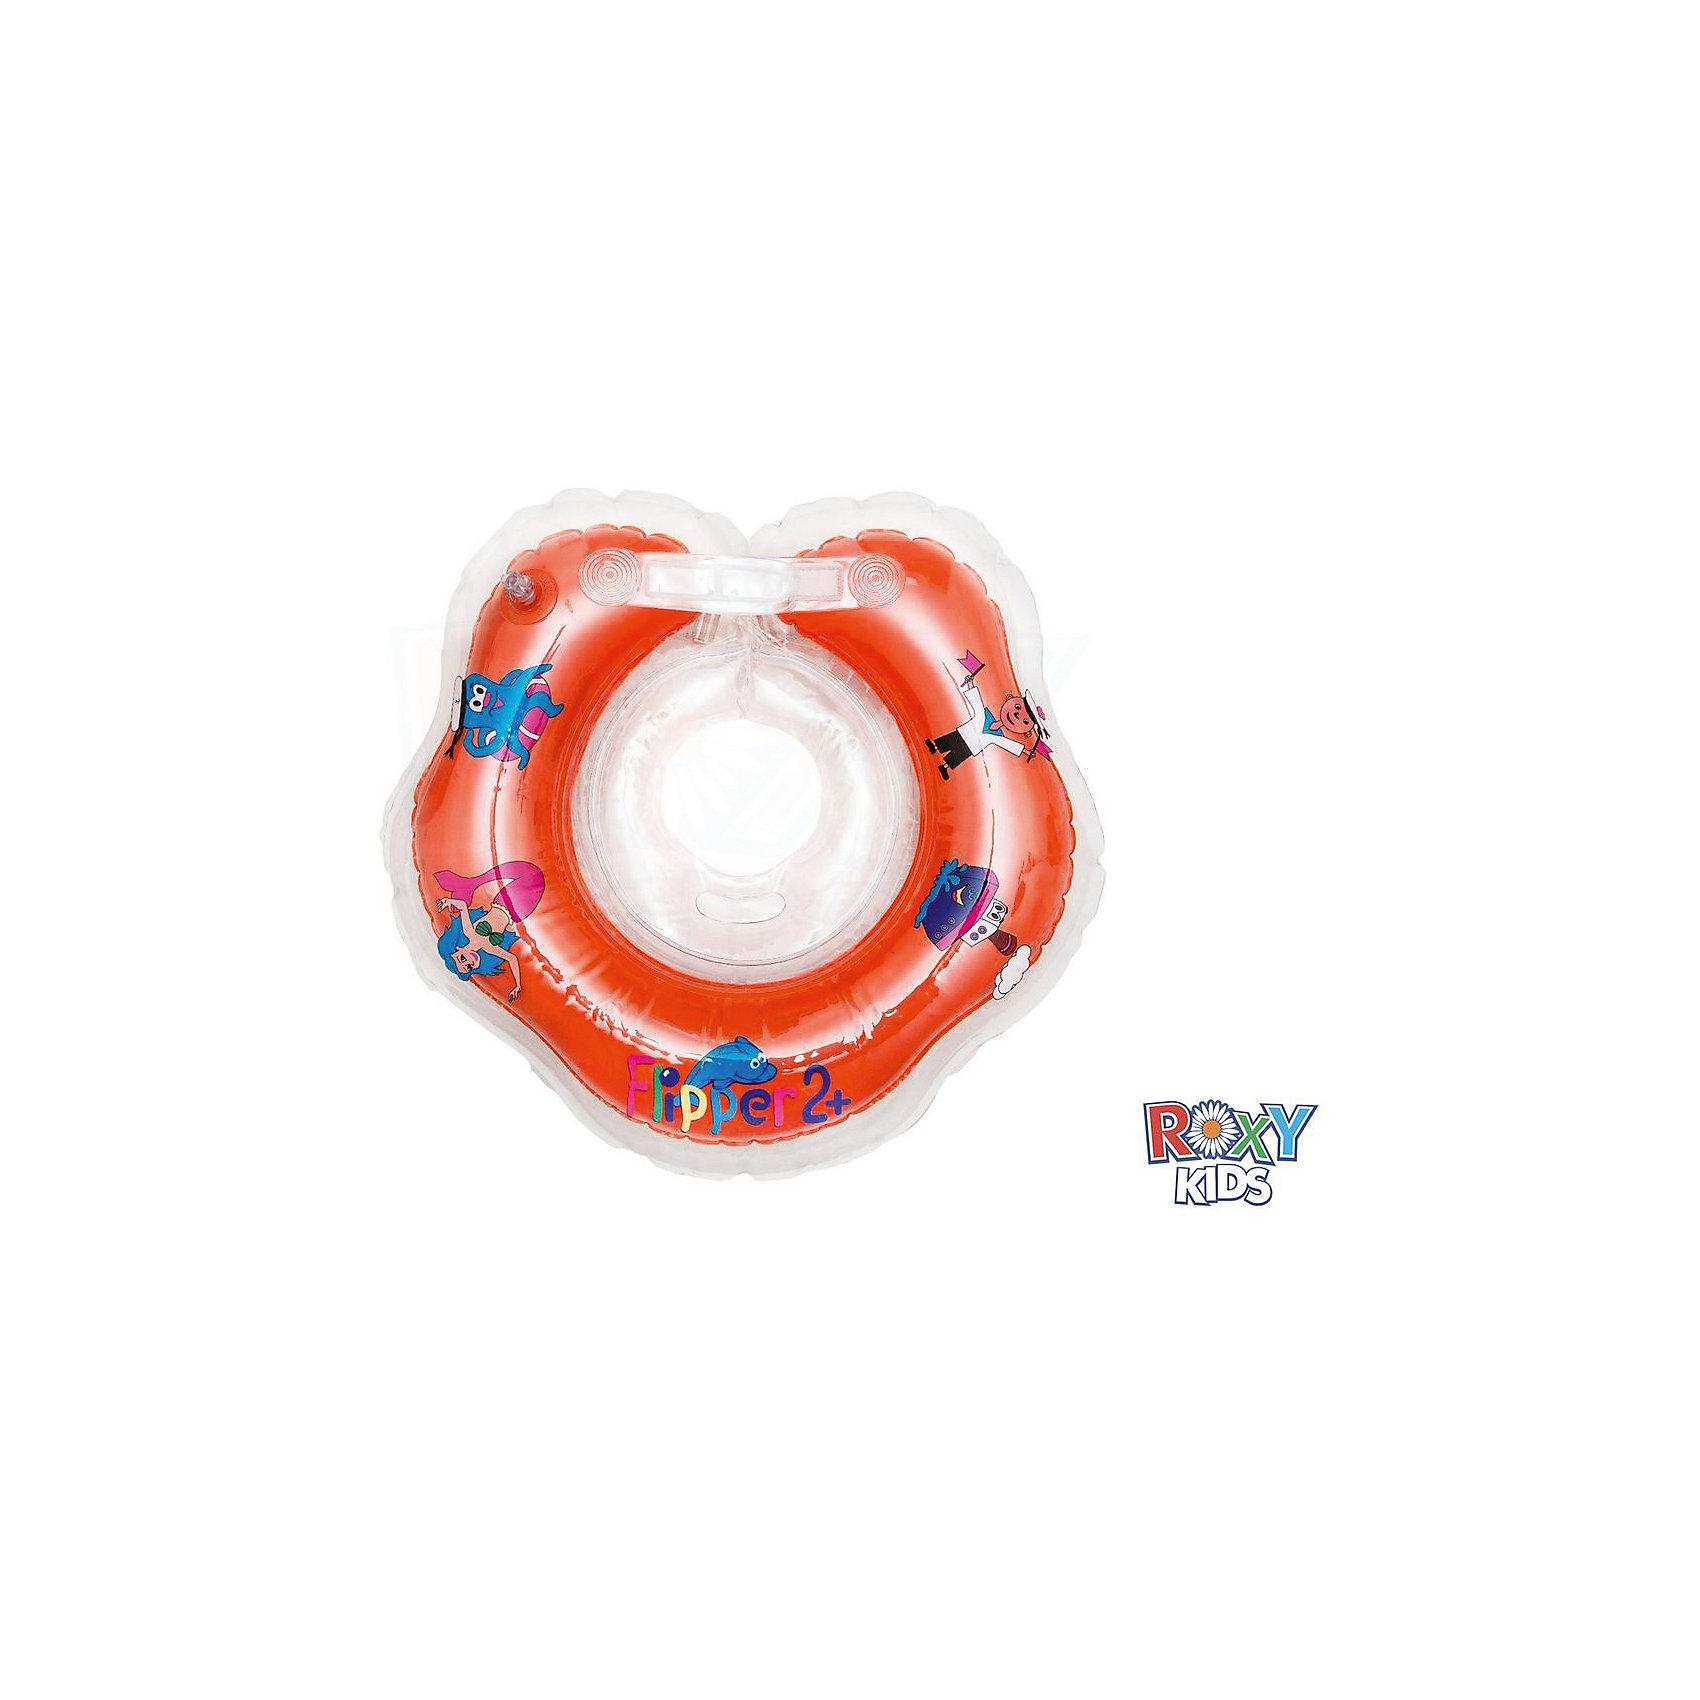 Roxy-Kids Надувной круг на шею Flipper 2+  для купания малышей, Roxy-Kids roxi kids fl002 круг на шею для купания малышей